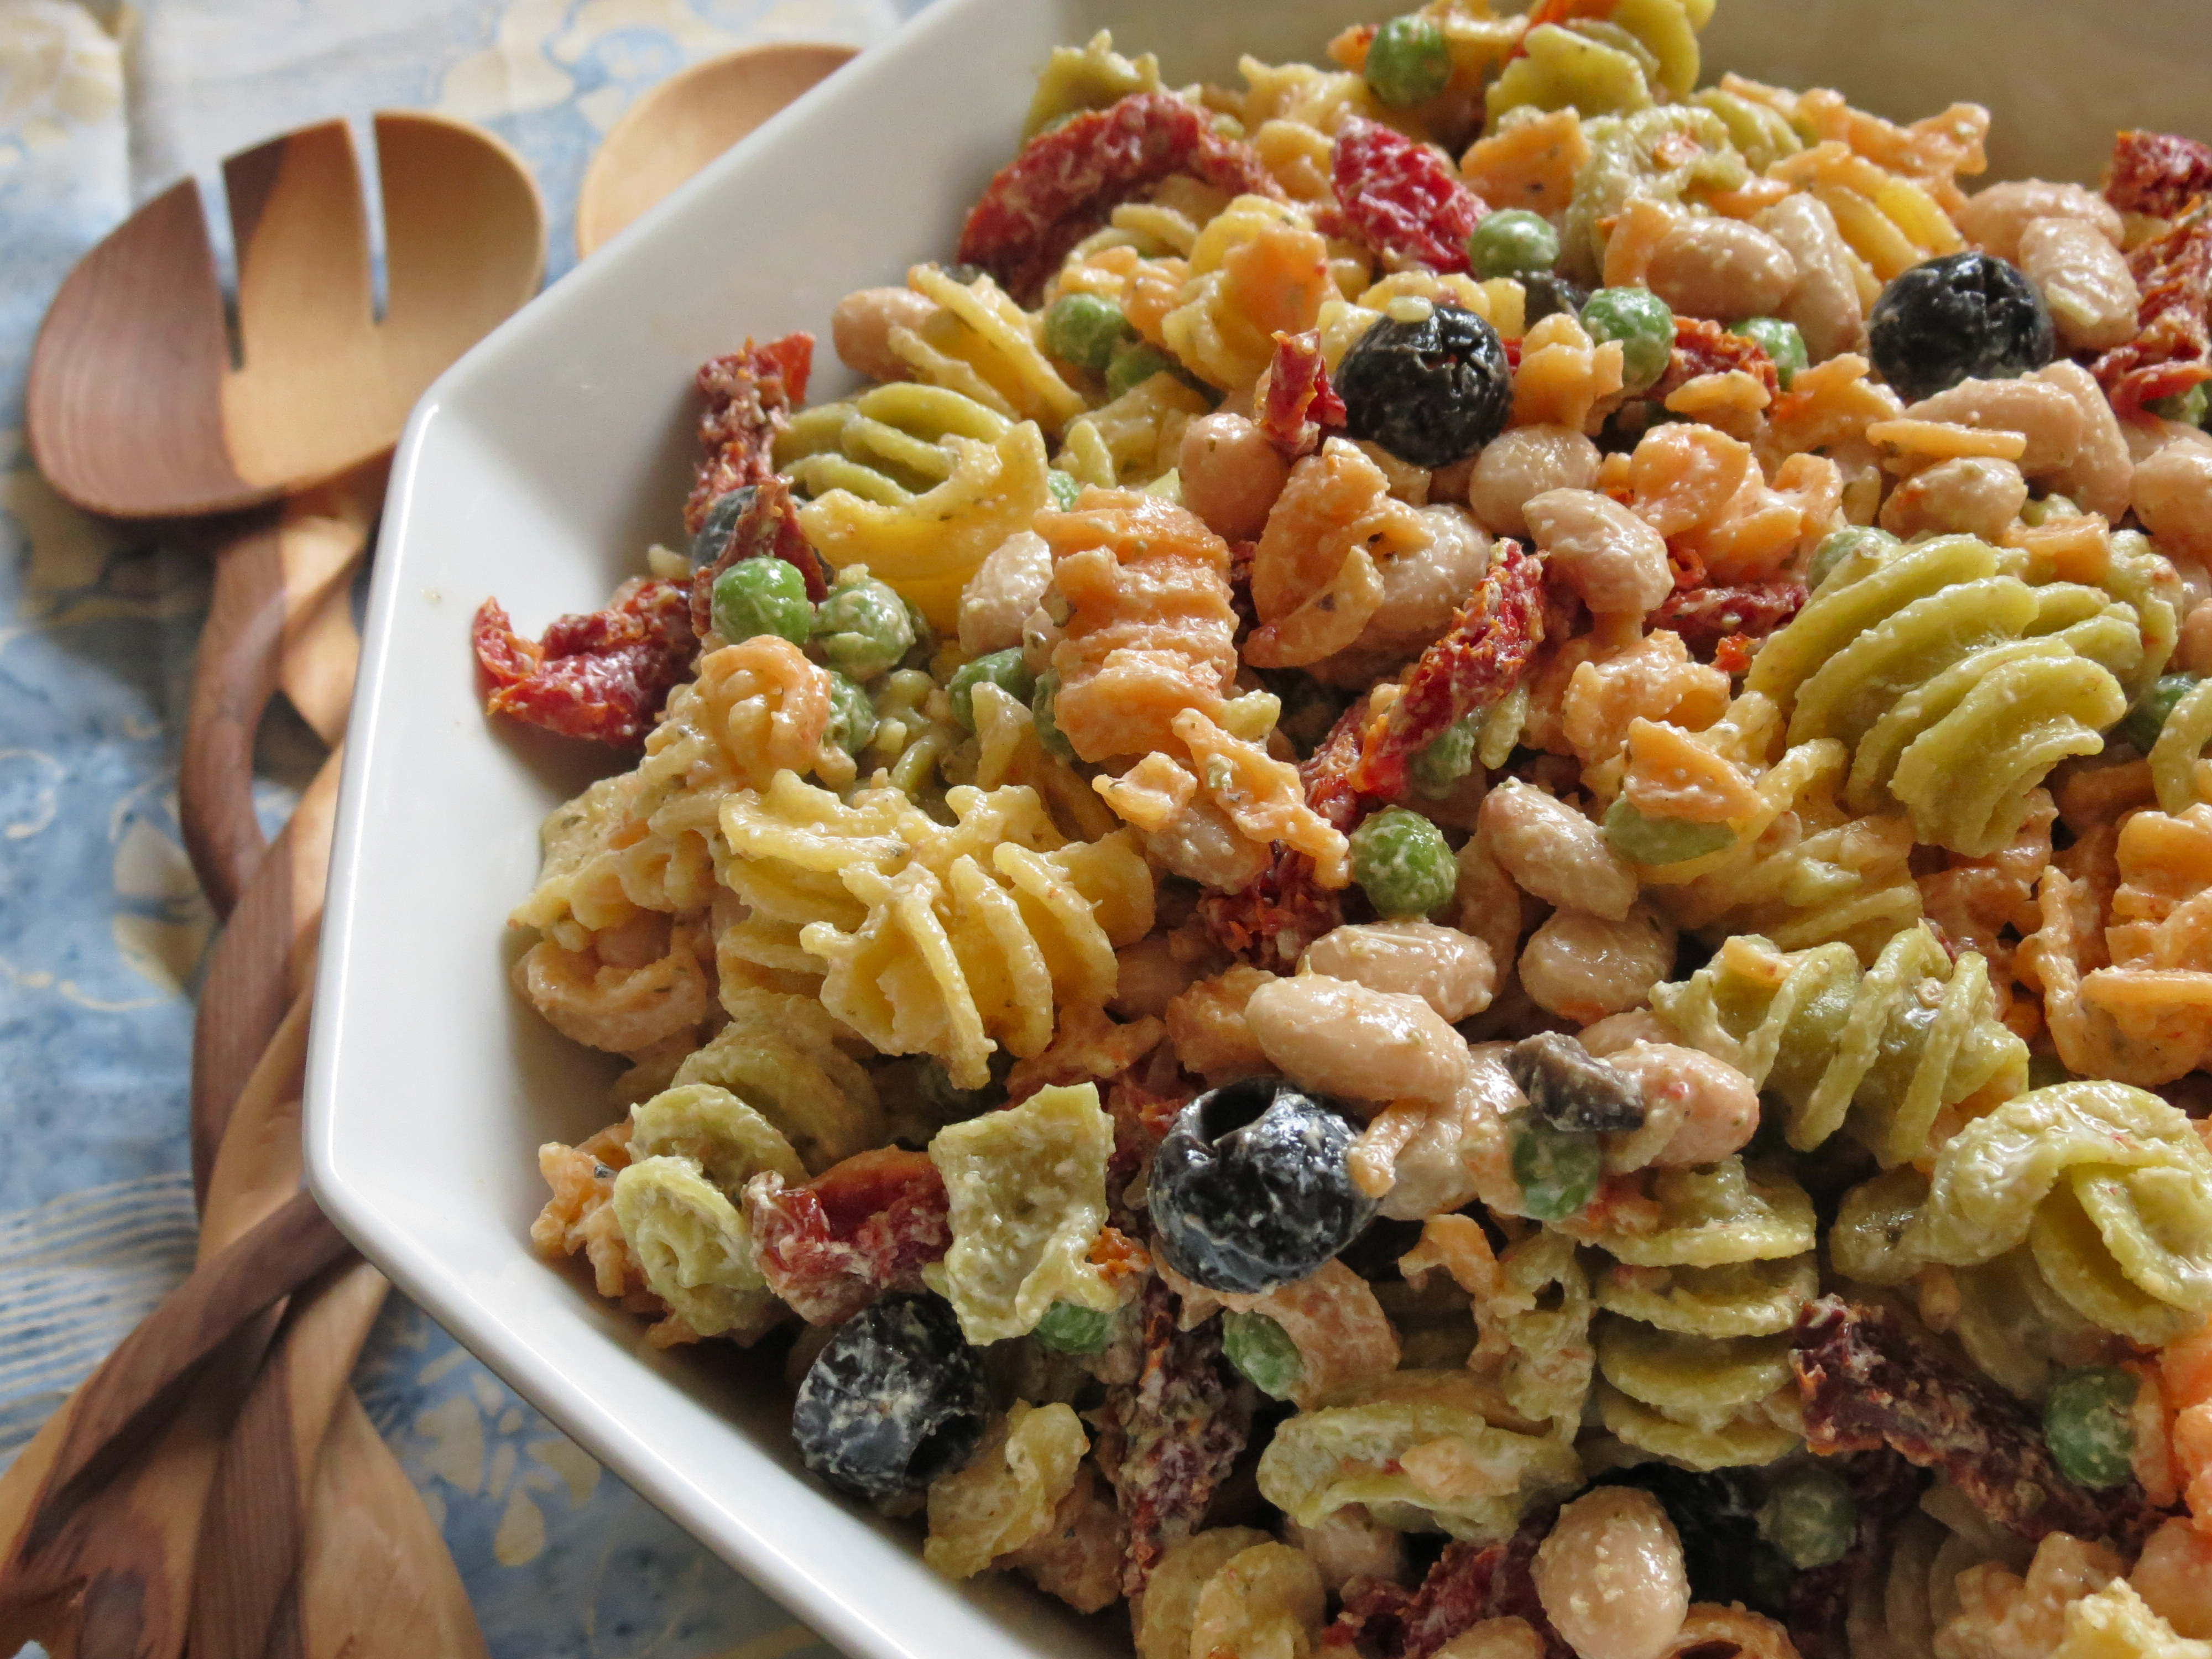 Creamy Mediterranean Pasta Salad